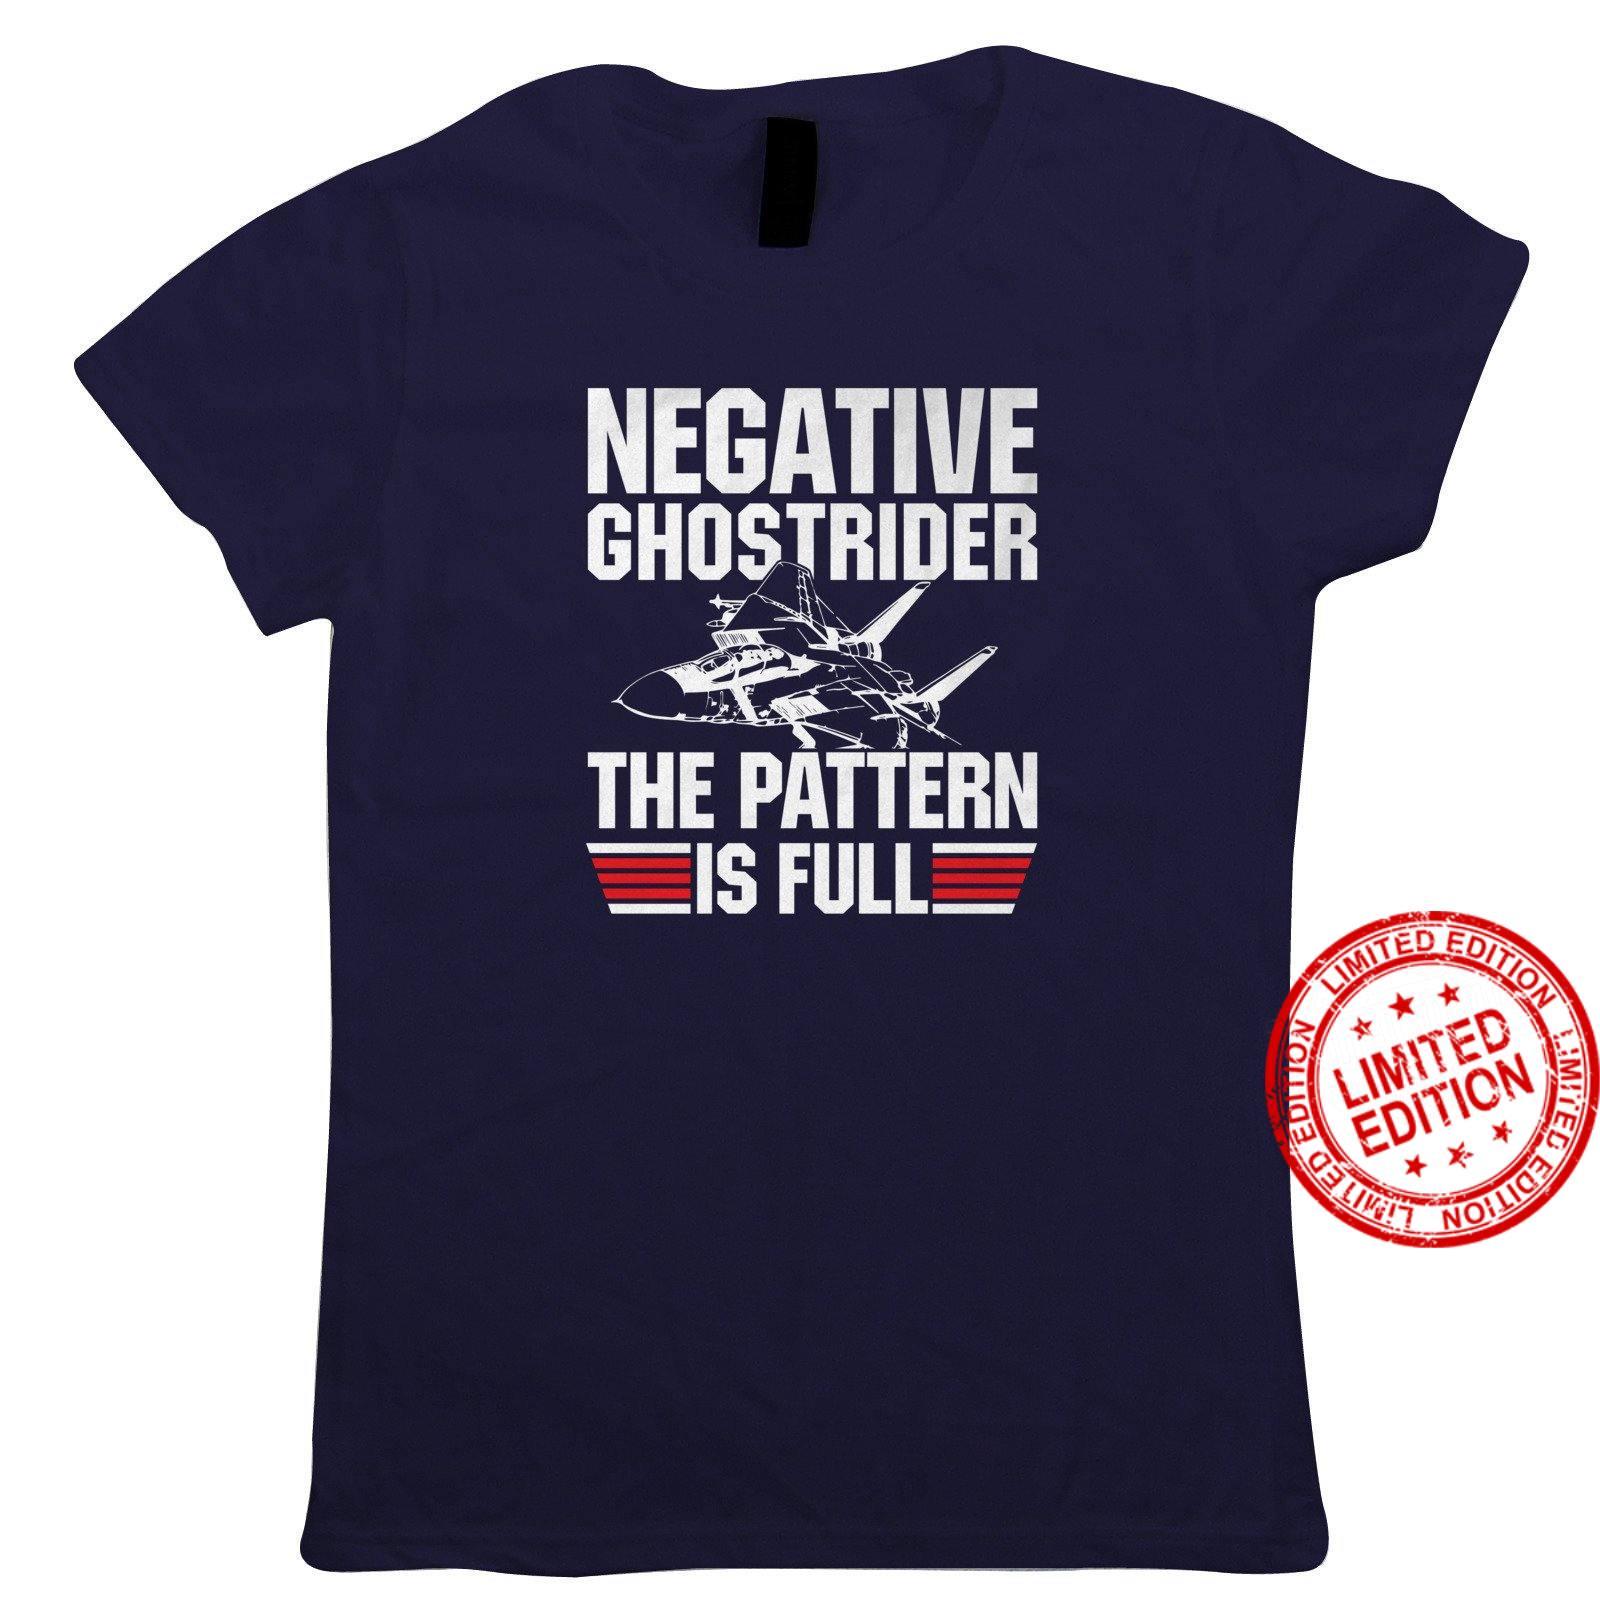 Negative Ghost Rider Top Gun Movie Inspired Shirt